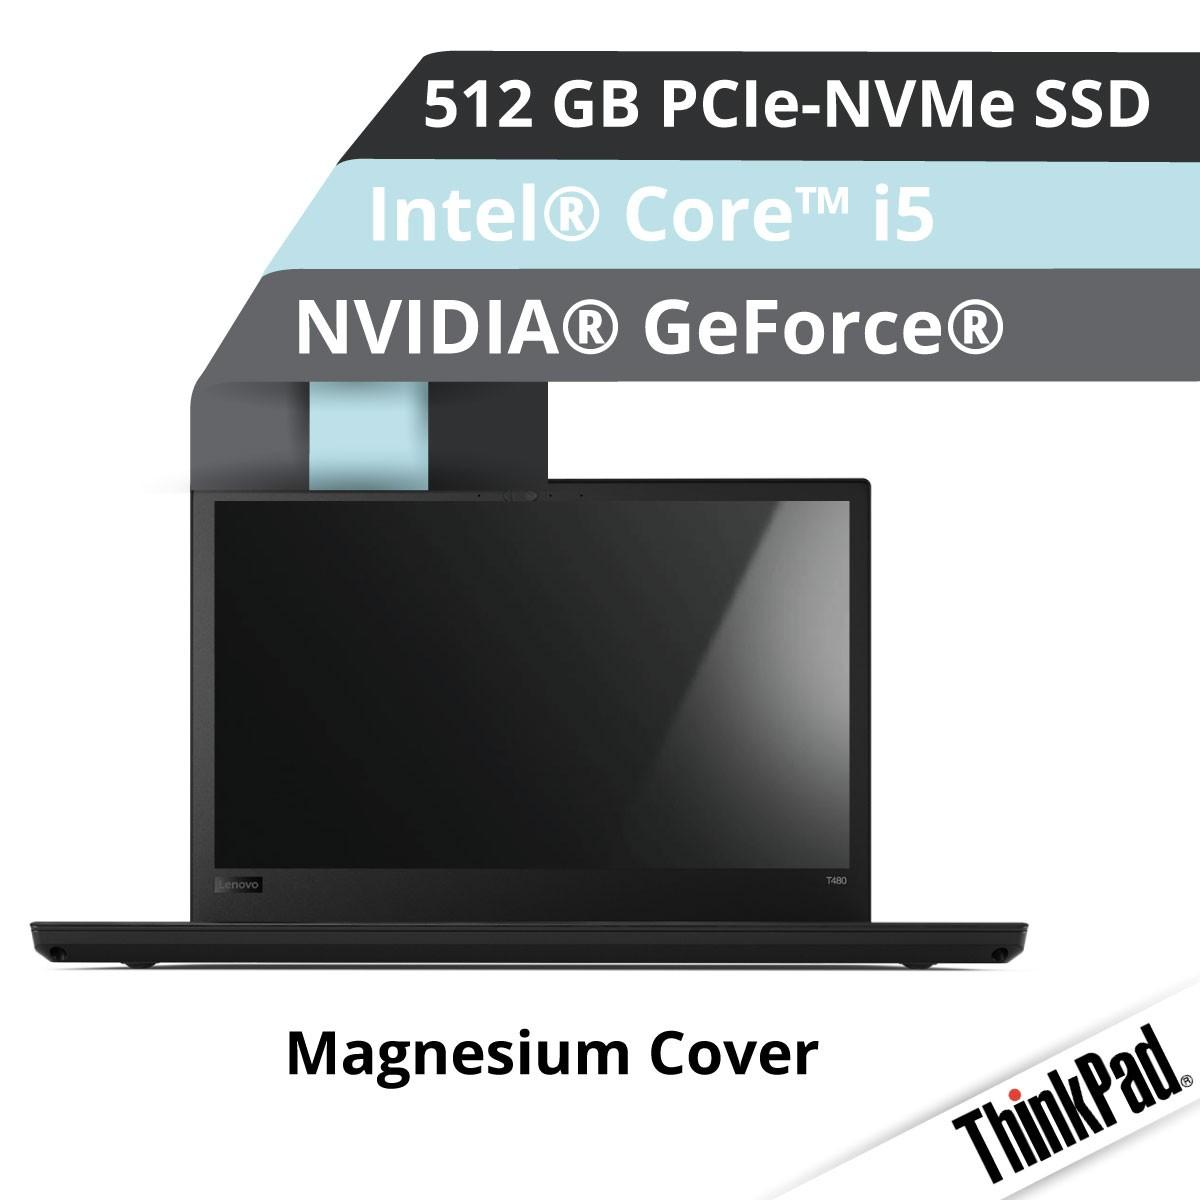 Lenovo™ ThinkPad® T580 Notebook Modell 20L9-0021 Demoartikel